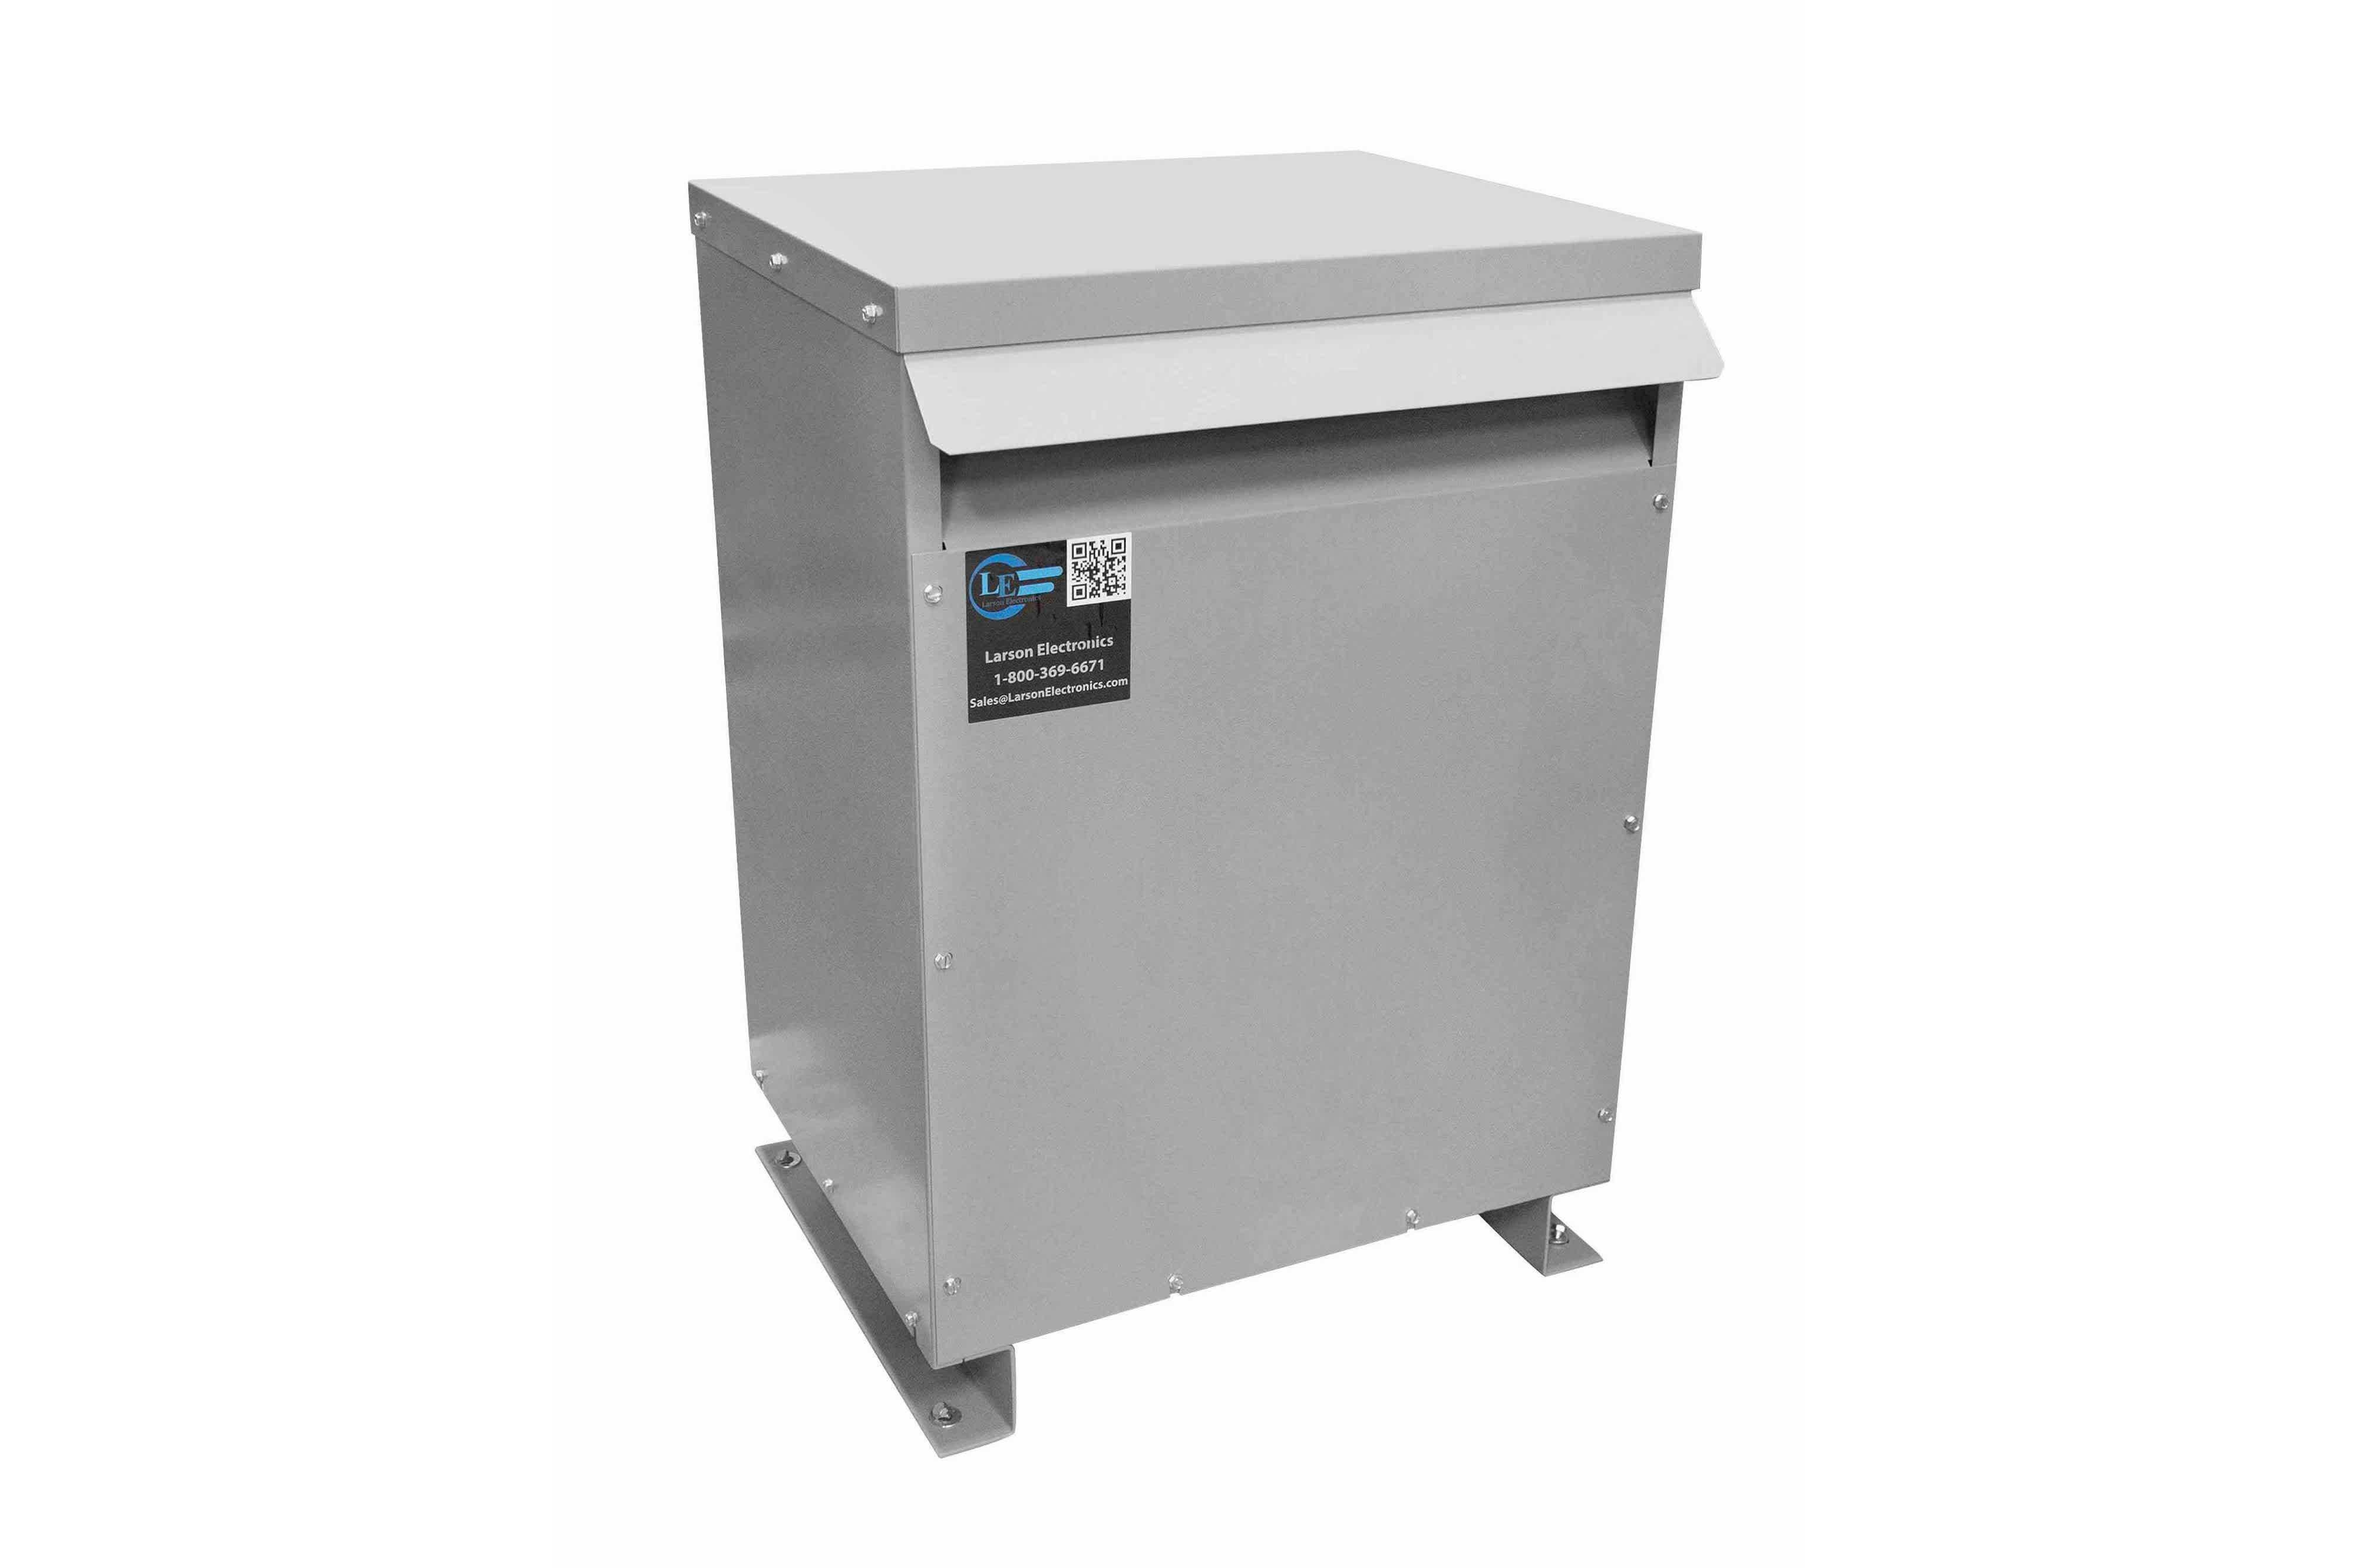 100 kVA 3PH DOE Transformer, 400V Delta Primary, 480Y/277 Wye-N Secondary, N3R, Ventilated, 60 Hz